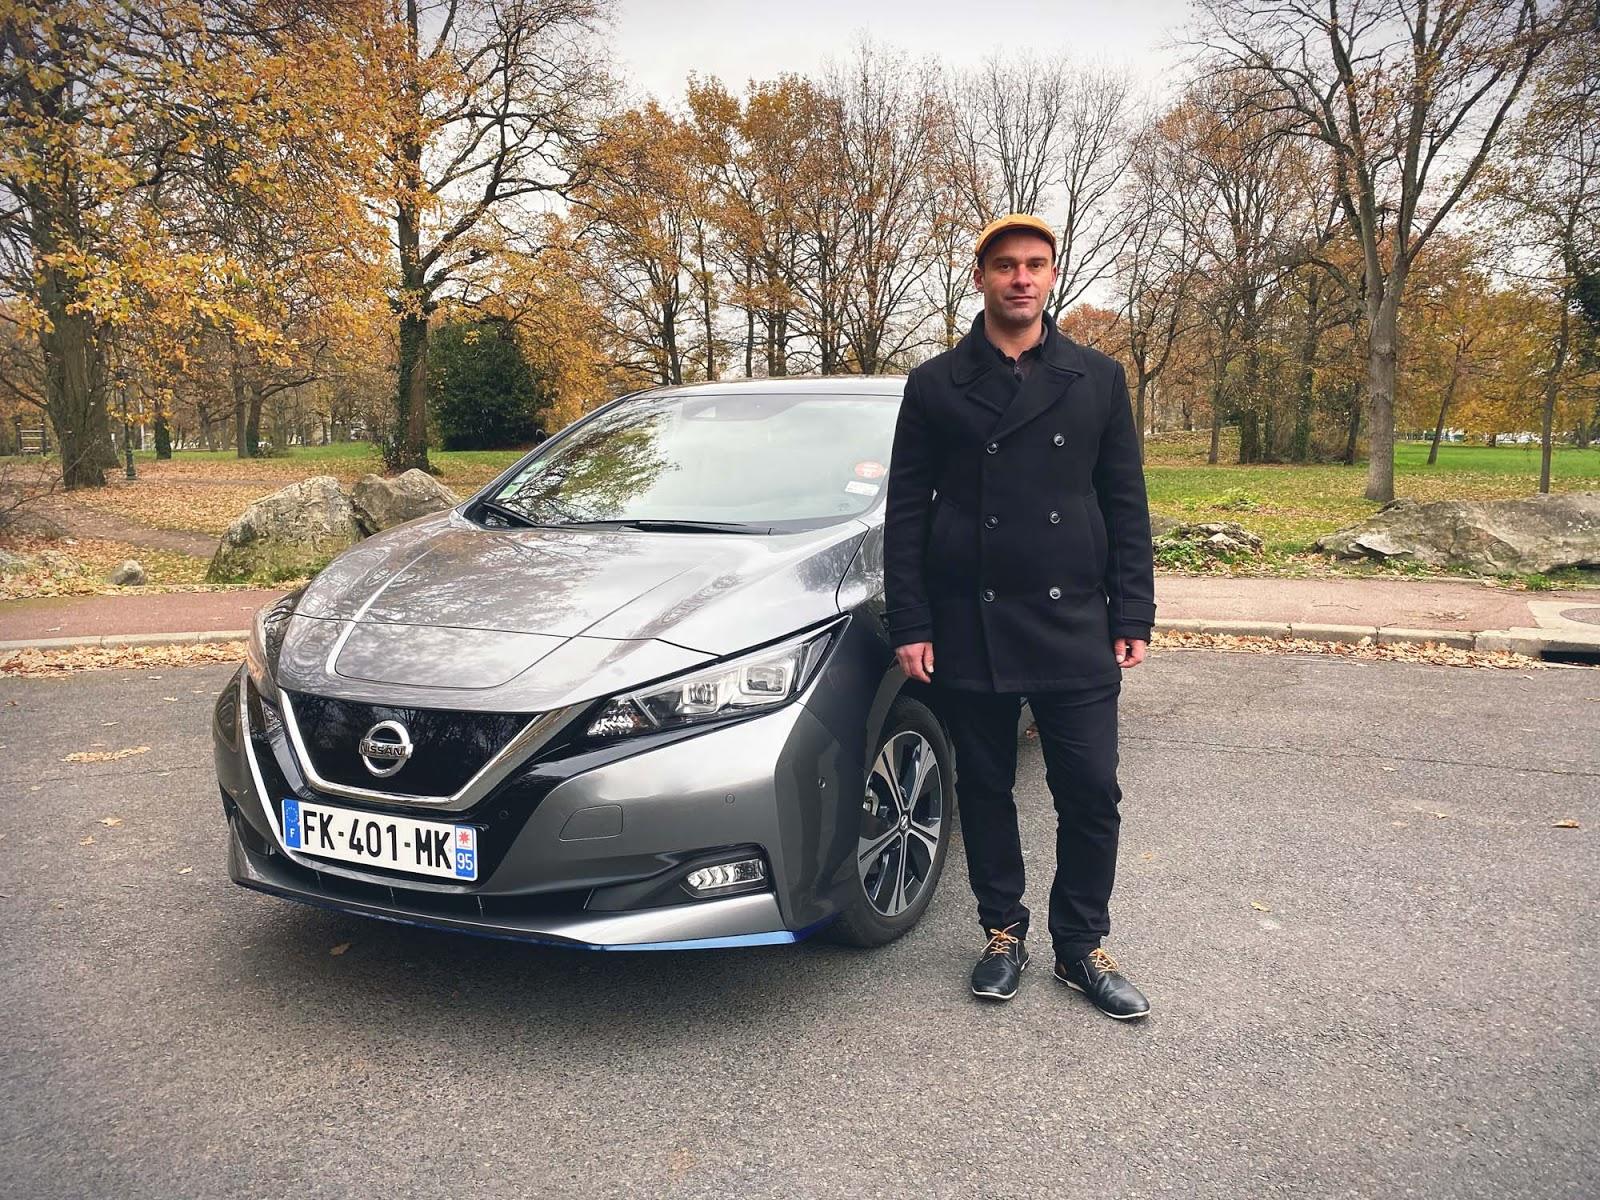 Picture2B1 1 Nissan : Το 70% των Ευρωπαίων οδηγών, σκέφτεται σοβαρά το επόμενο τους αυτοκίνητο, να είναι ηλεκτρικό Electric cars, electric vehicles, EV, Nissan, ειδήσεις, ηλεκτρικά, ηλεκτροκινηση